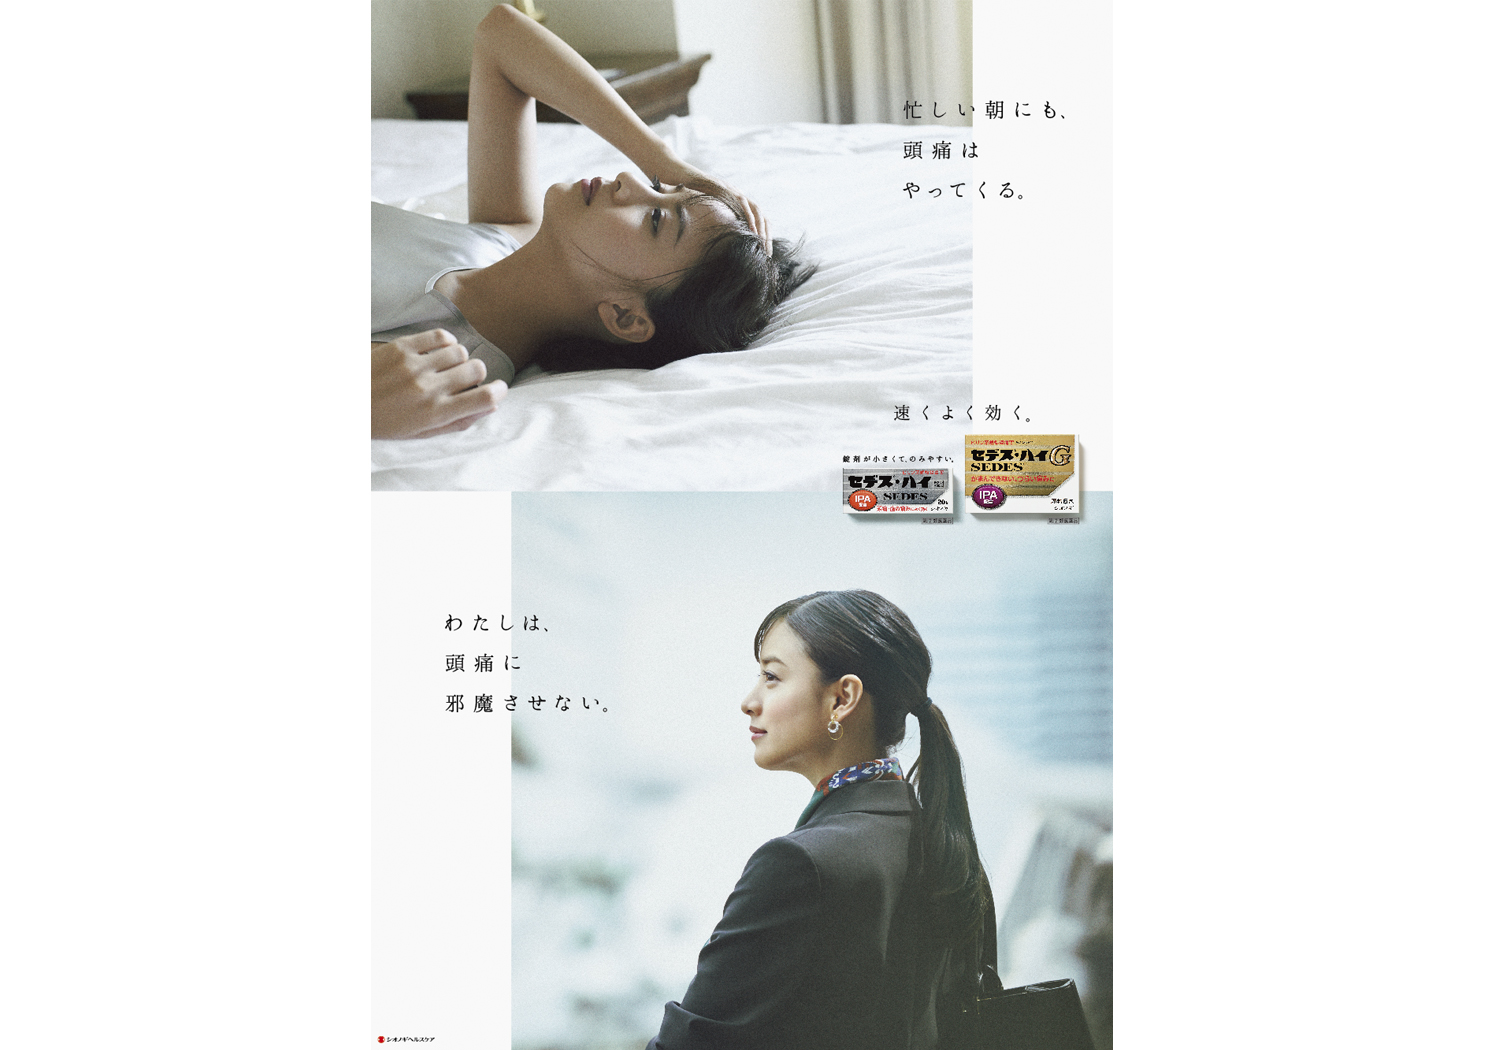 Shionogi SEDES poster